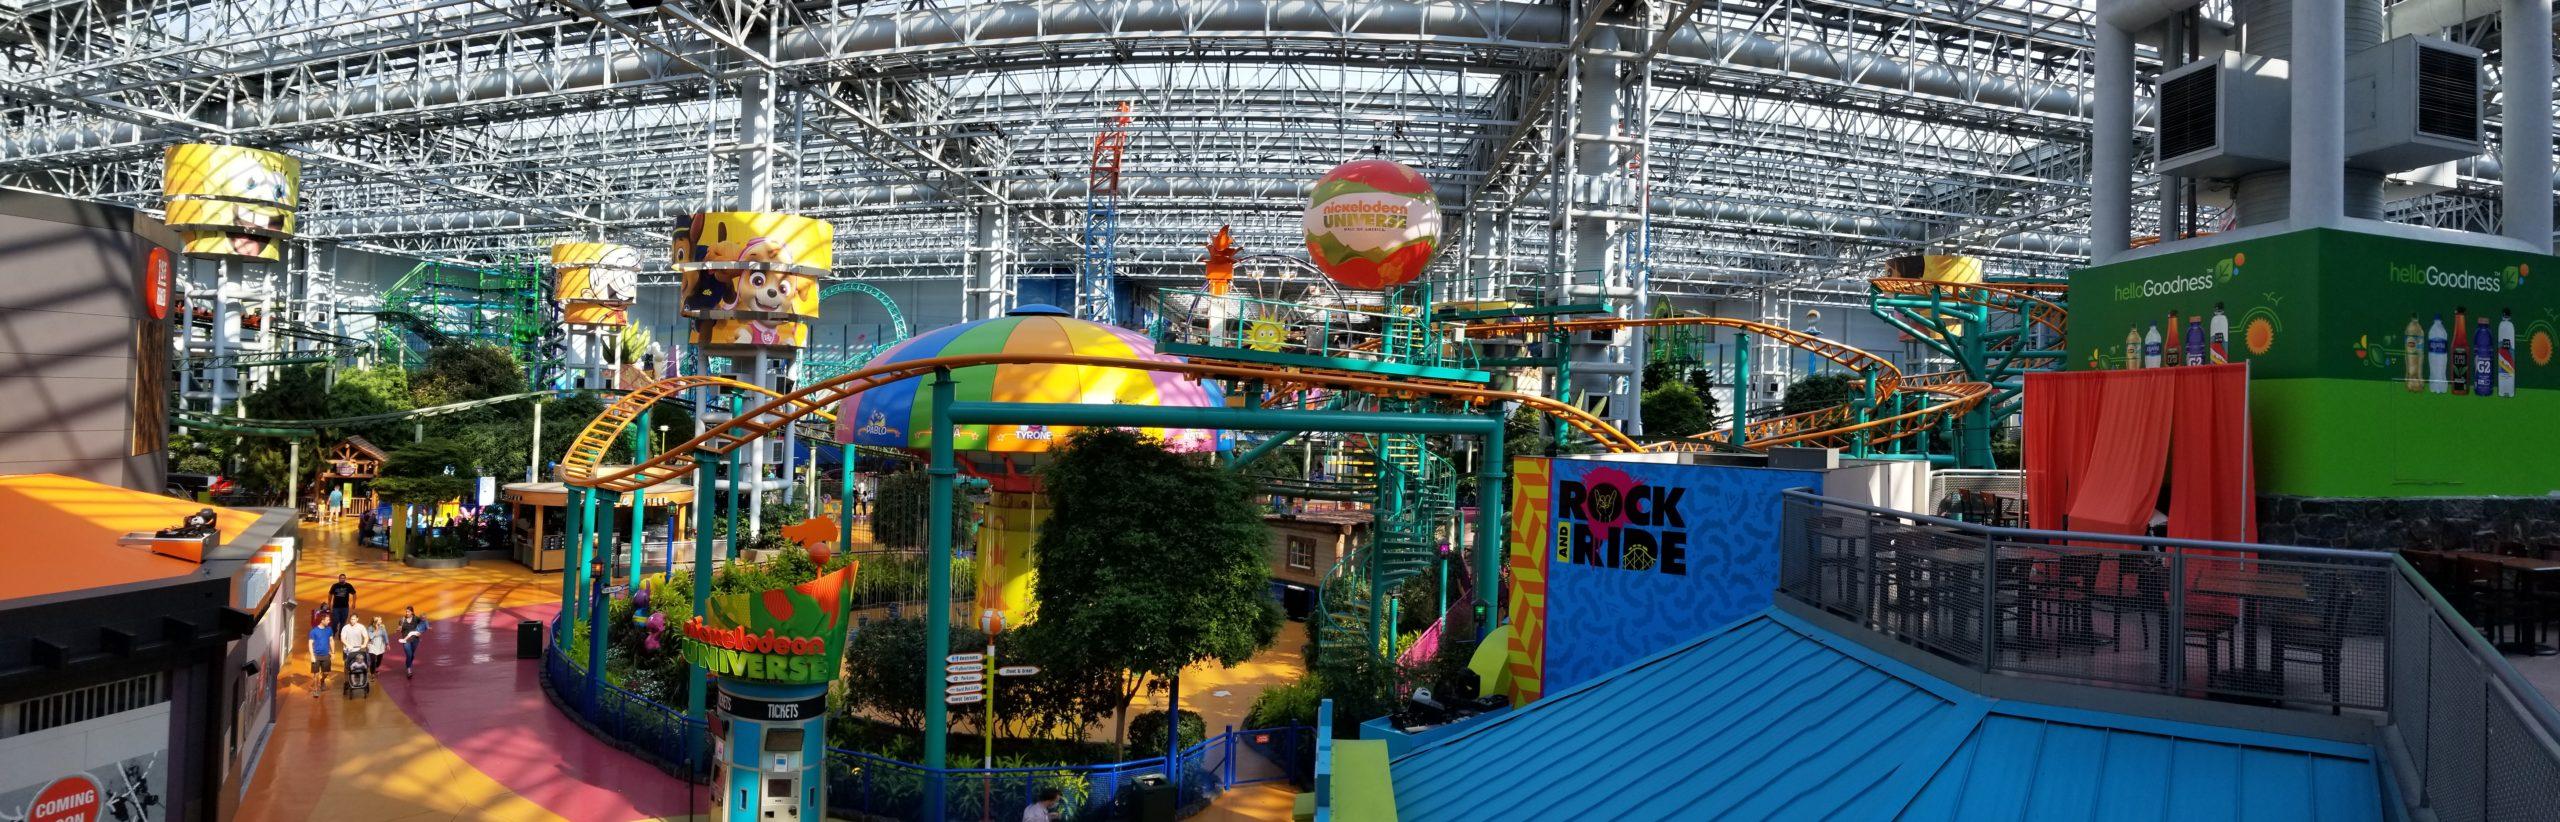 Mall of America Theme Park 2